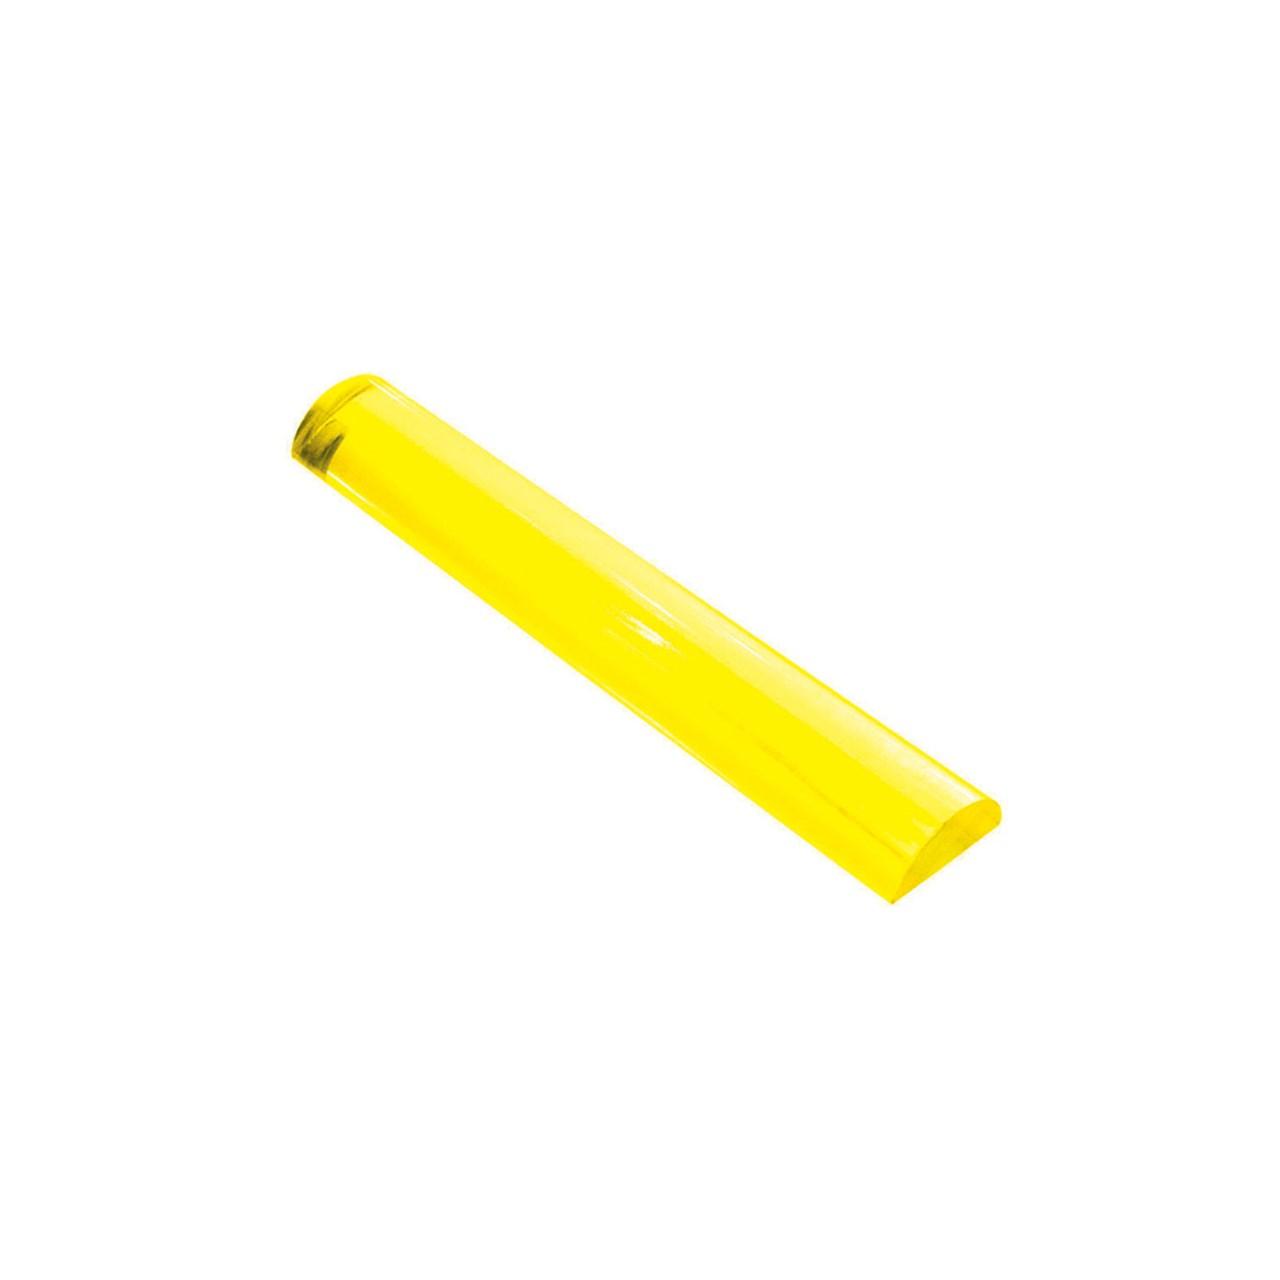 EZ Magnibar - All Yellow - 6 inches